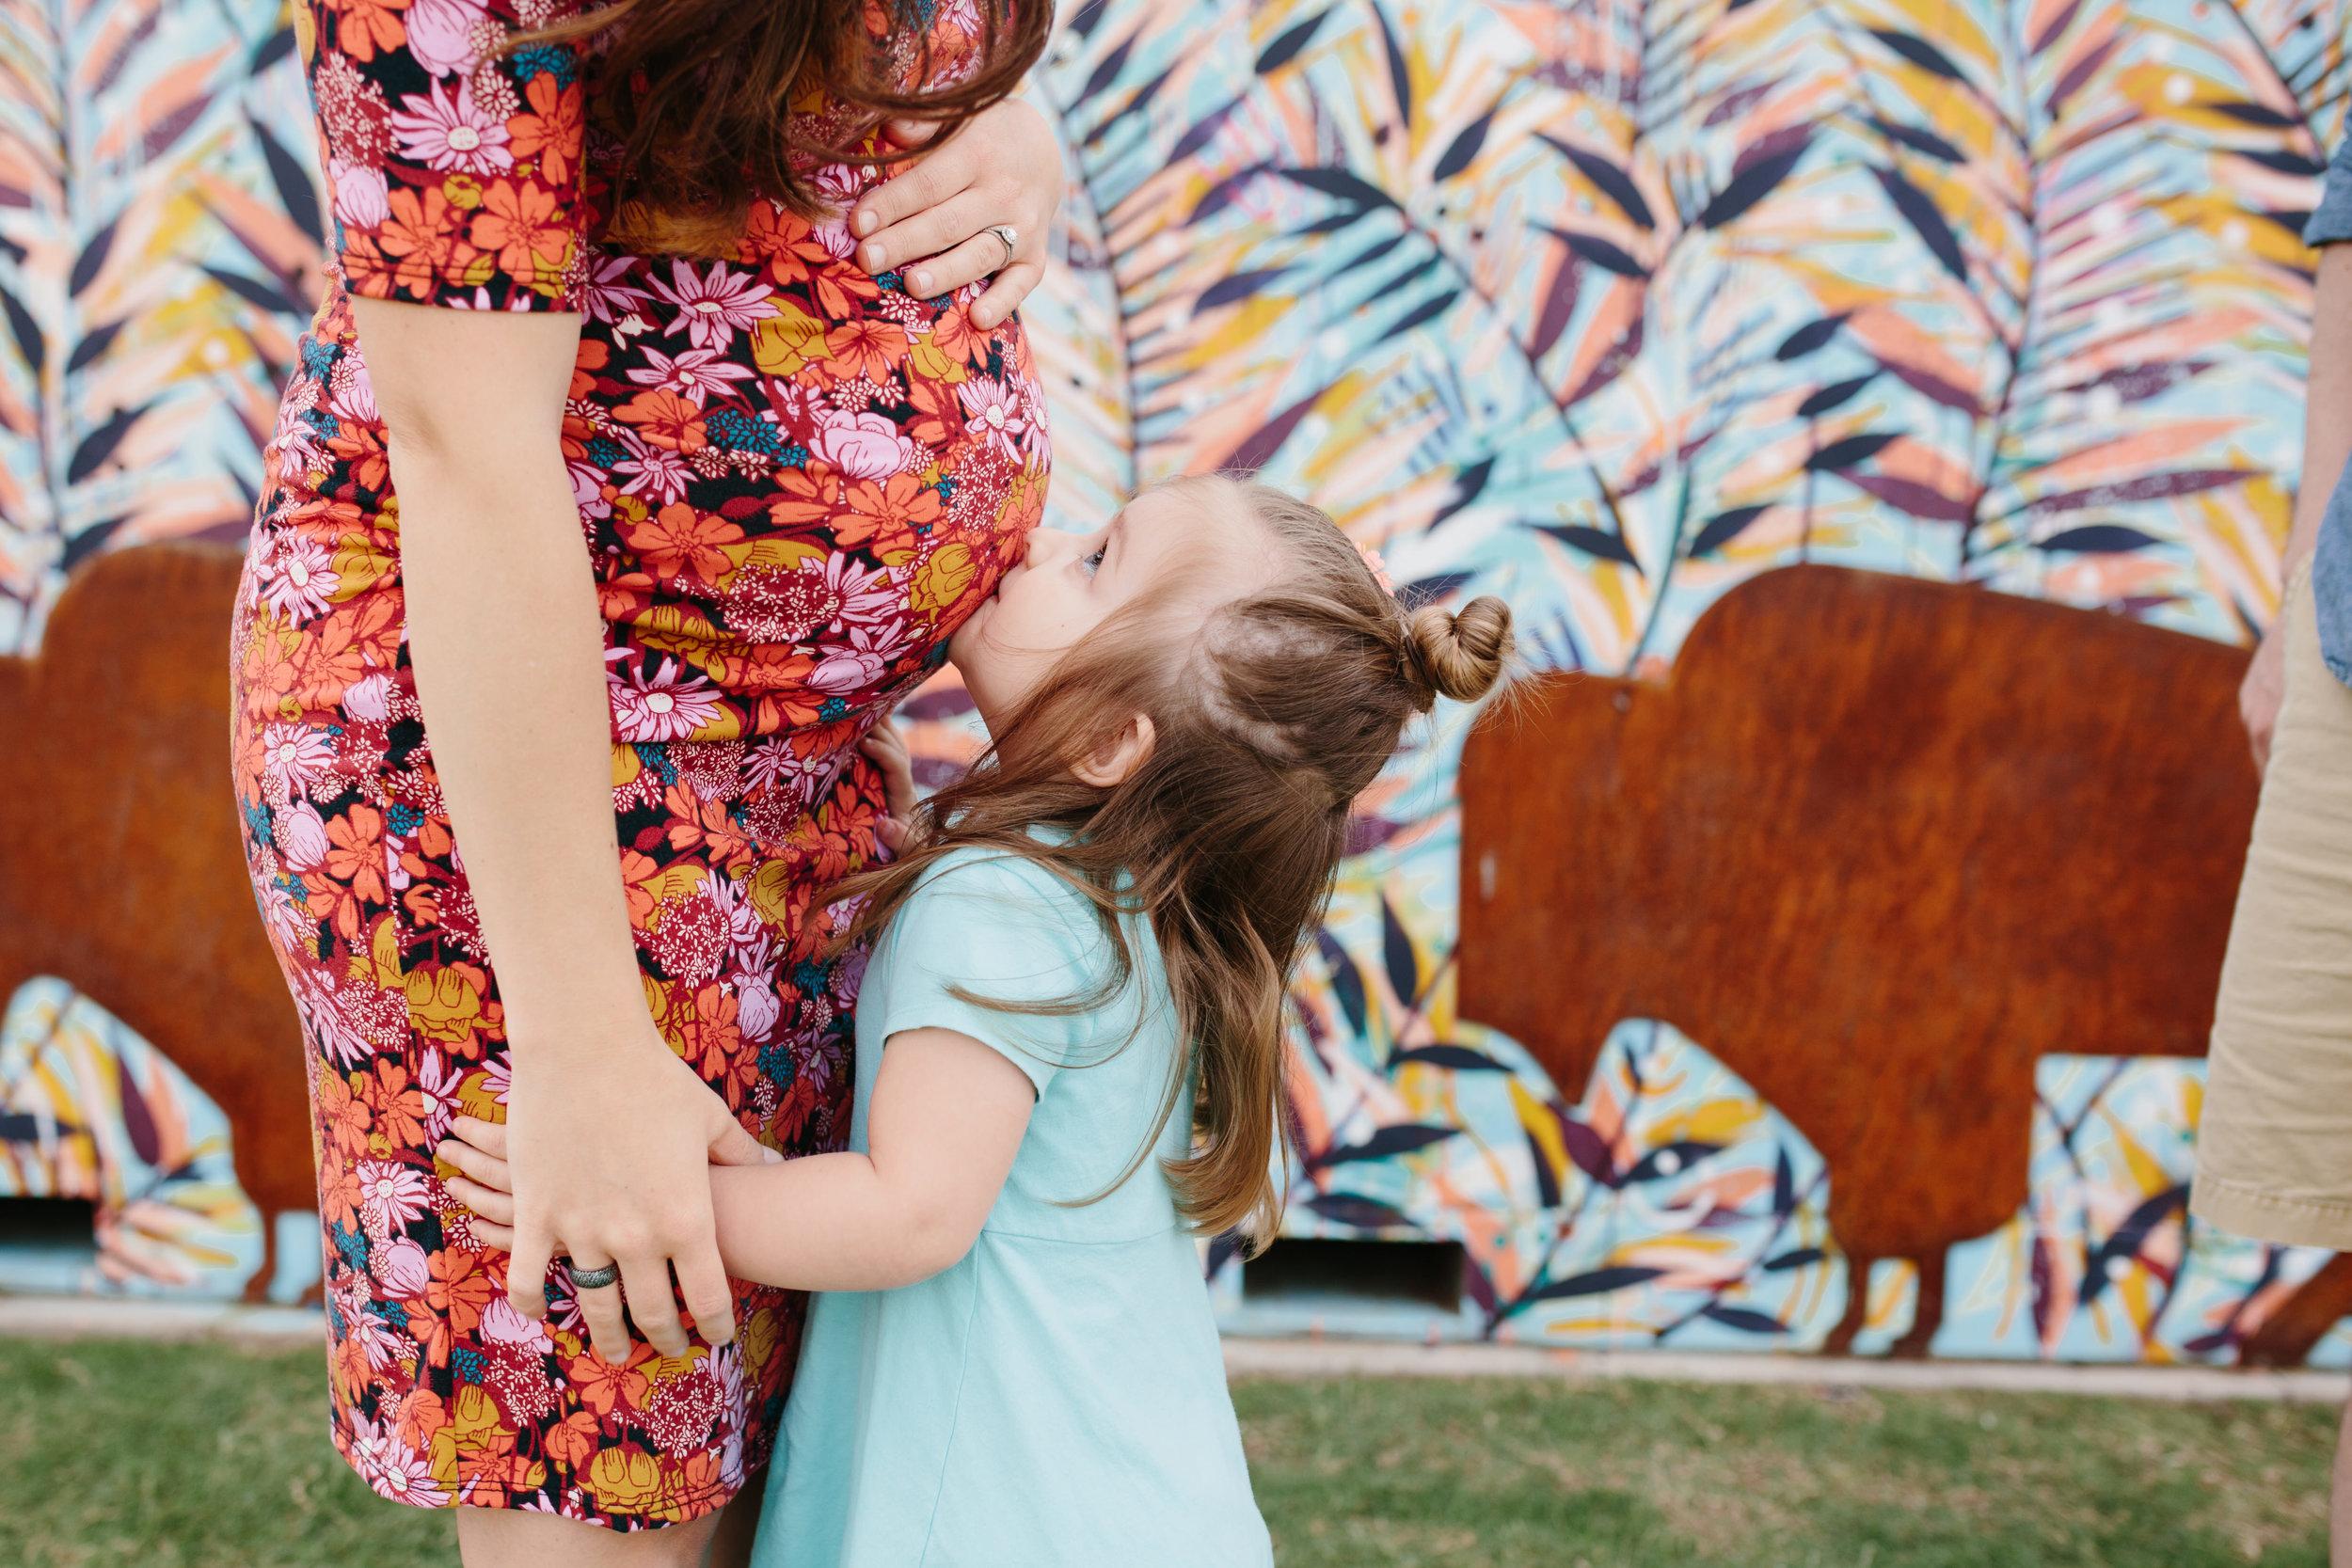 midtown-okc-mural-maternity-photos.JPG